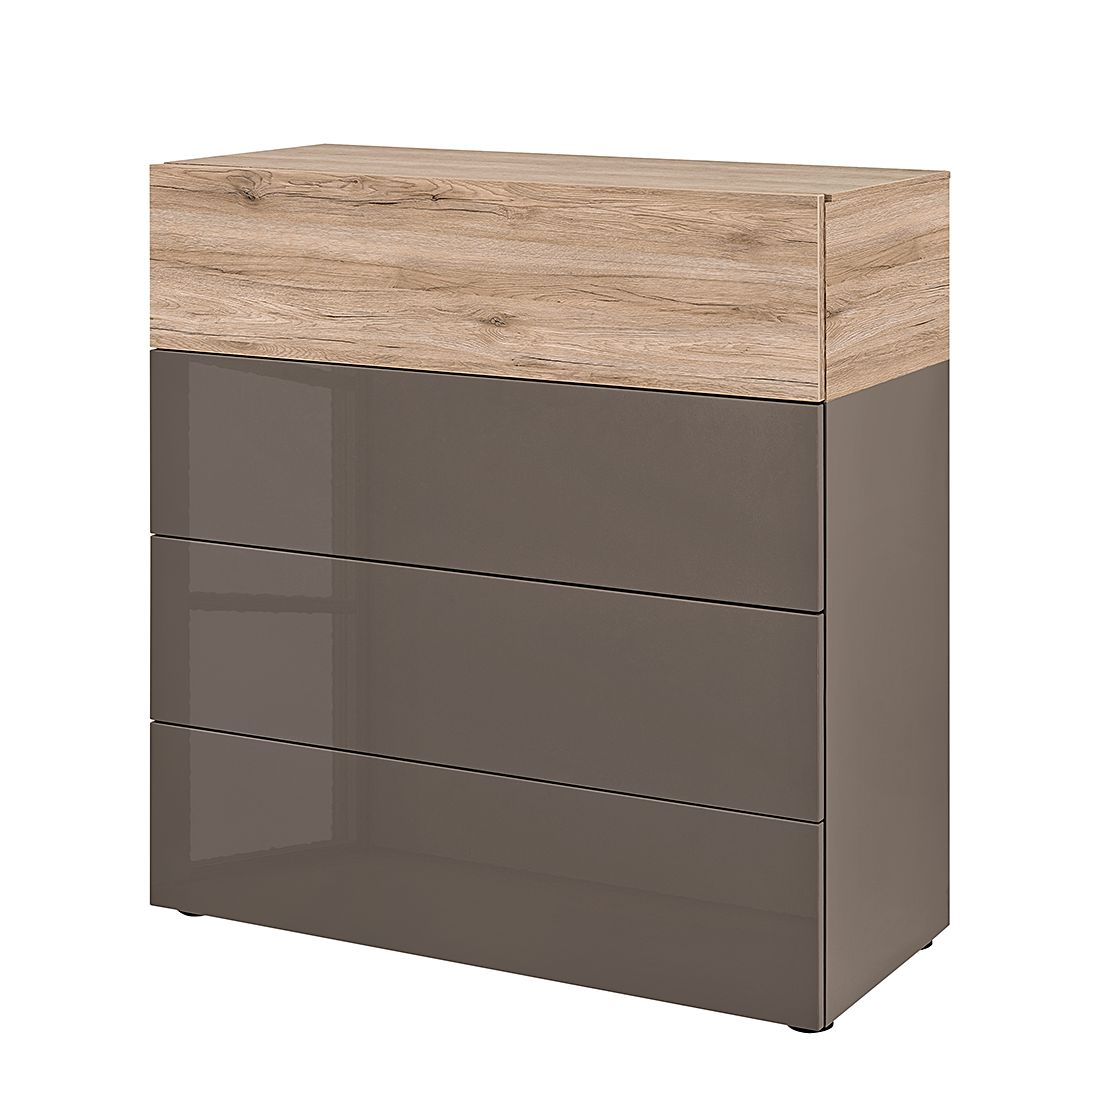 sideboard beam i cubanit hochglanz cubanit eiche dunkel dekor arte m g nstig kaufen. Black Bedroom Furniture Sets. Home Design Ideas